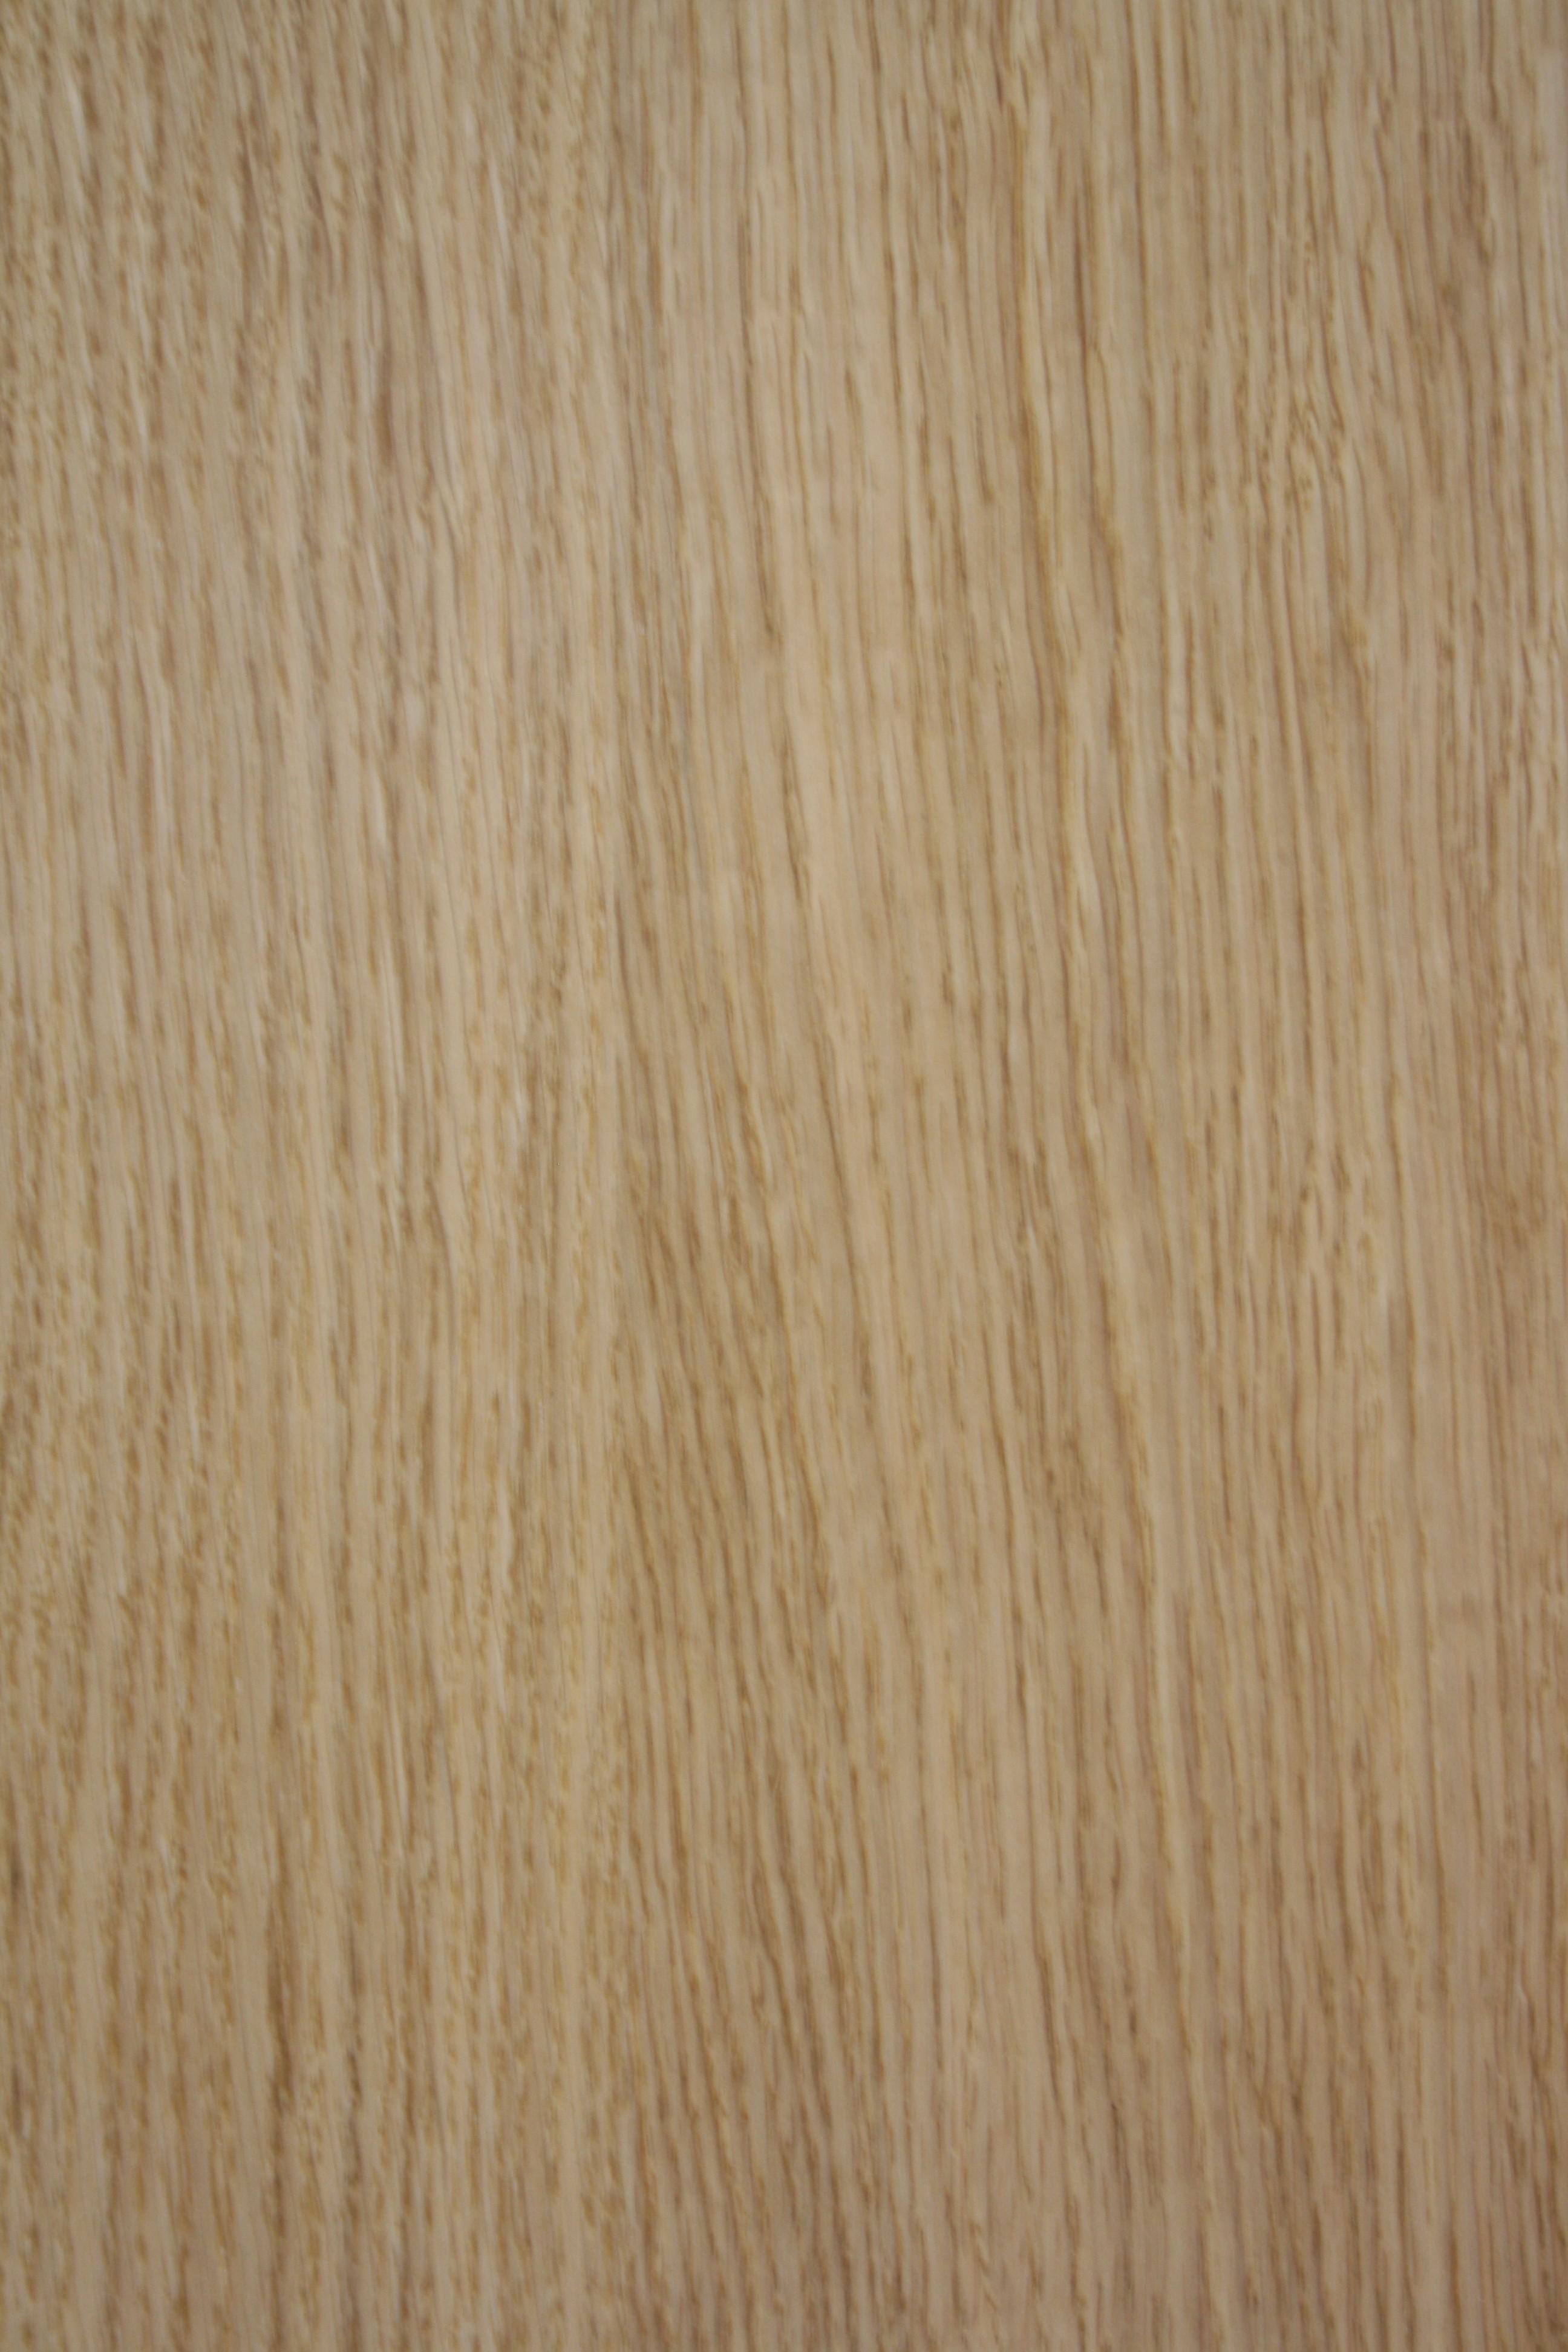 Rechapado roble mallado maderas g mez for Zapateros de madera de roble